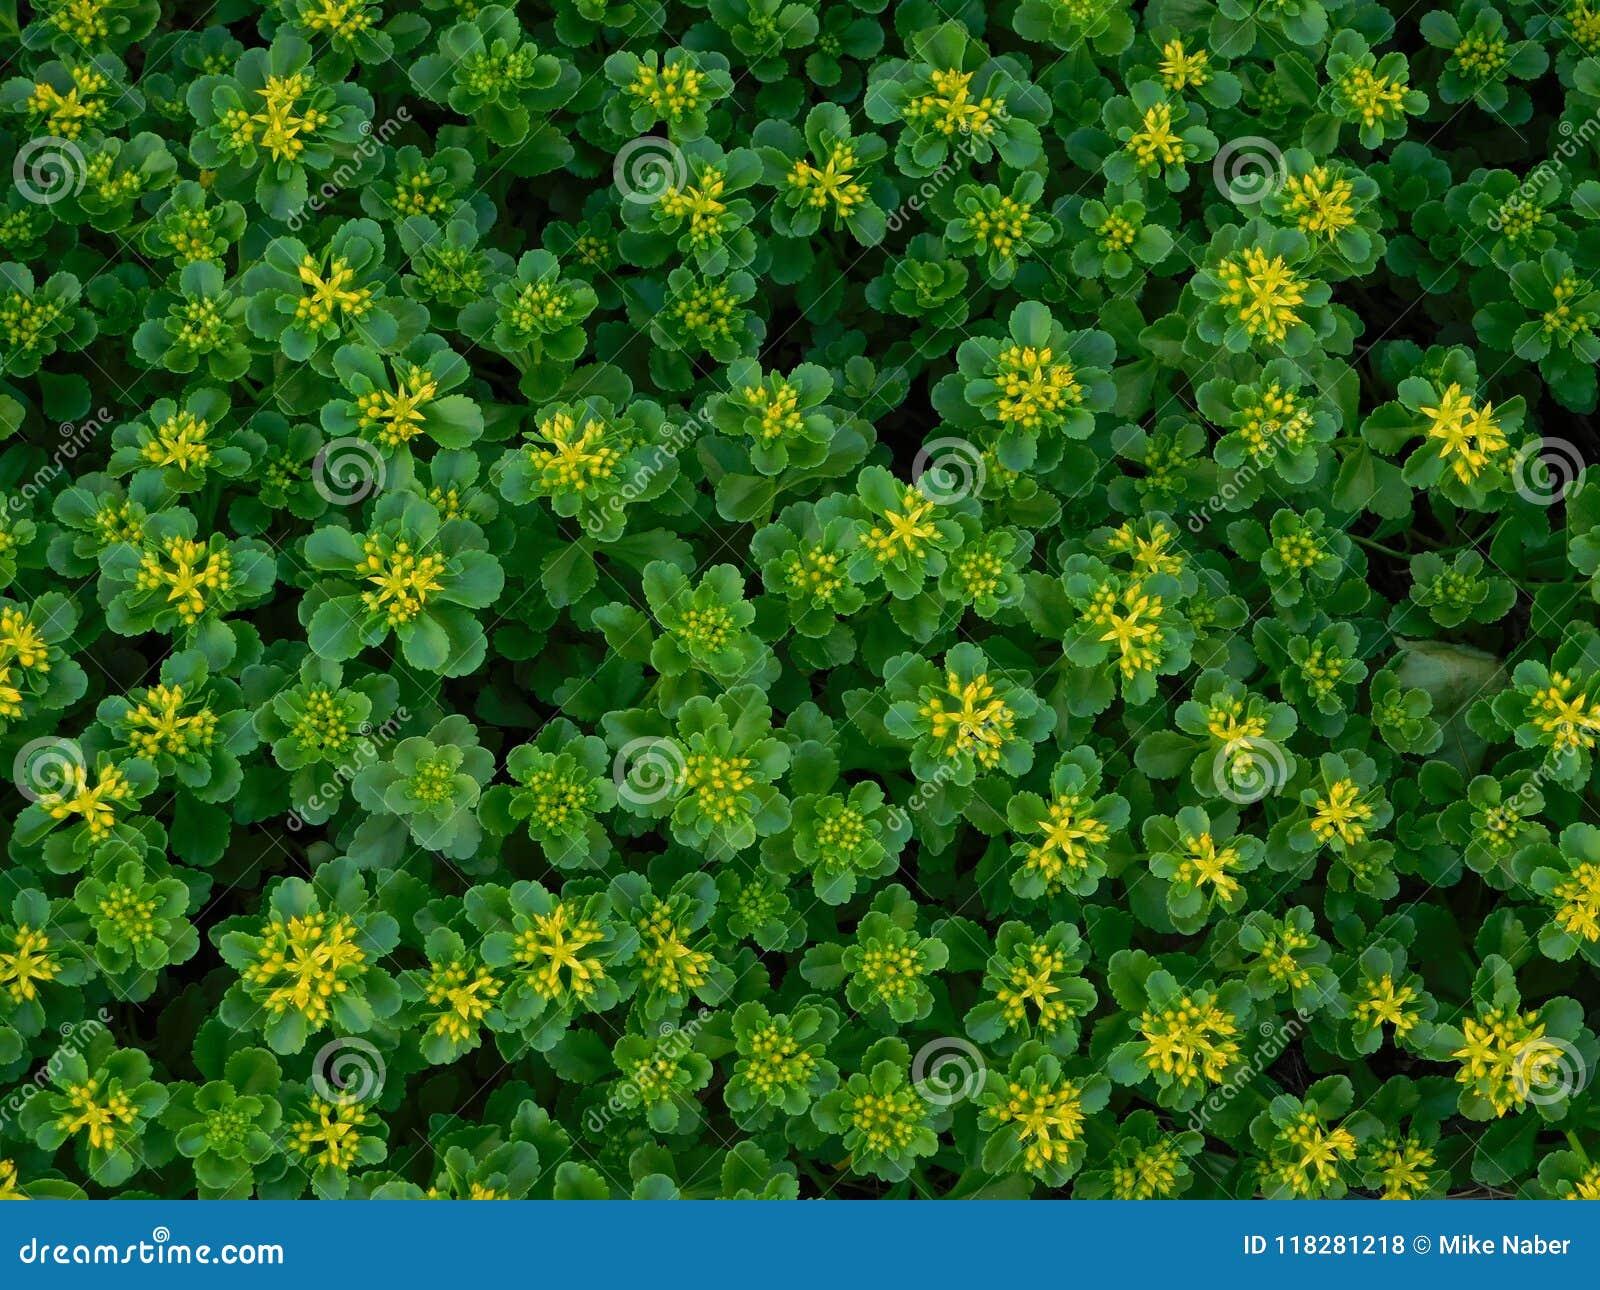 Tiny yellow flowers stock photo image of cluster pretty 118281218 tiny yellow flowers that are very pretty mightylinksfo